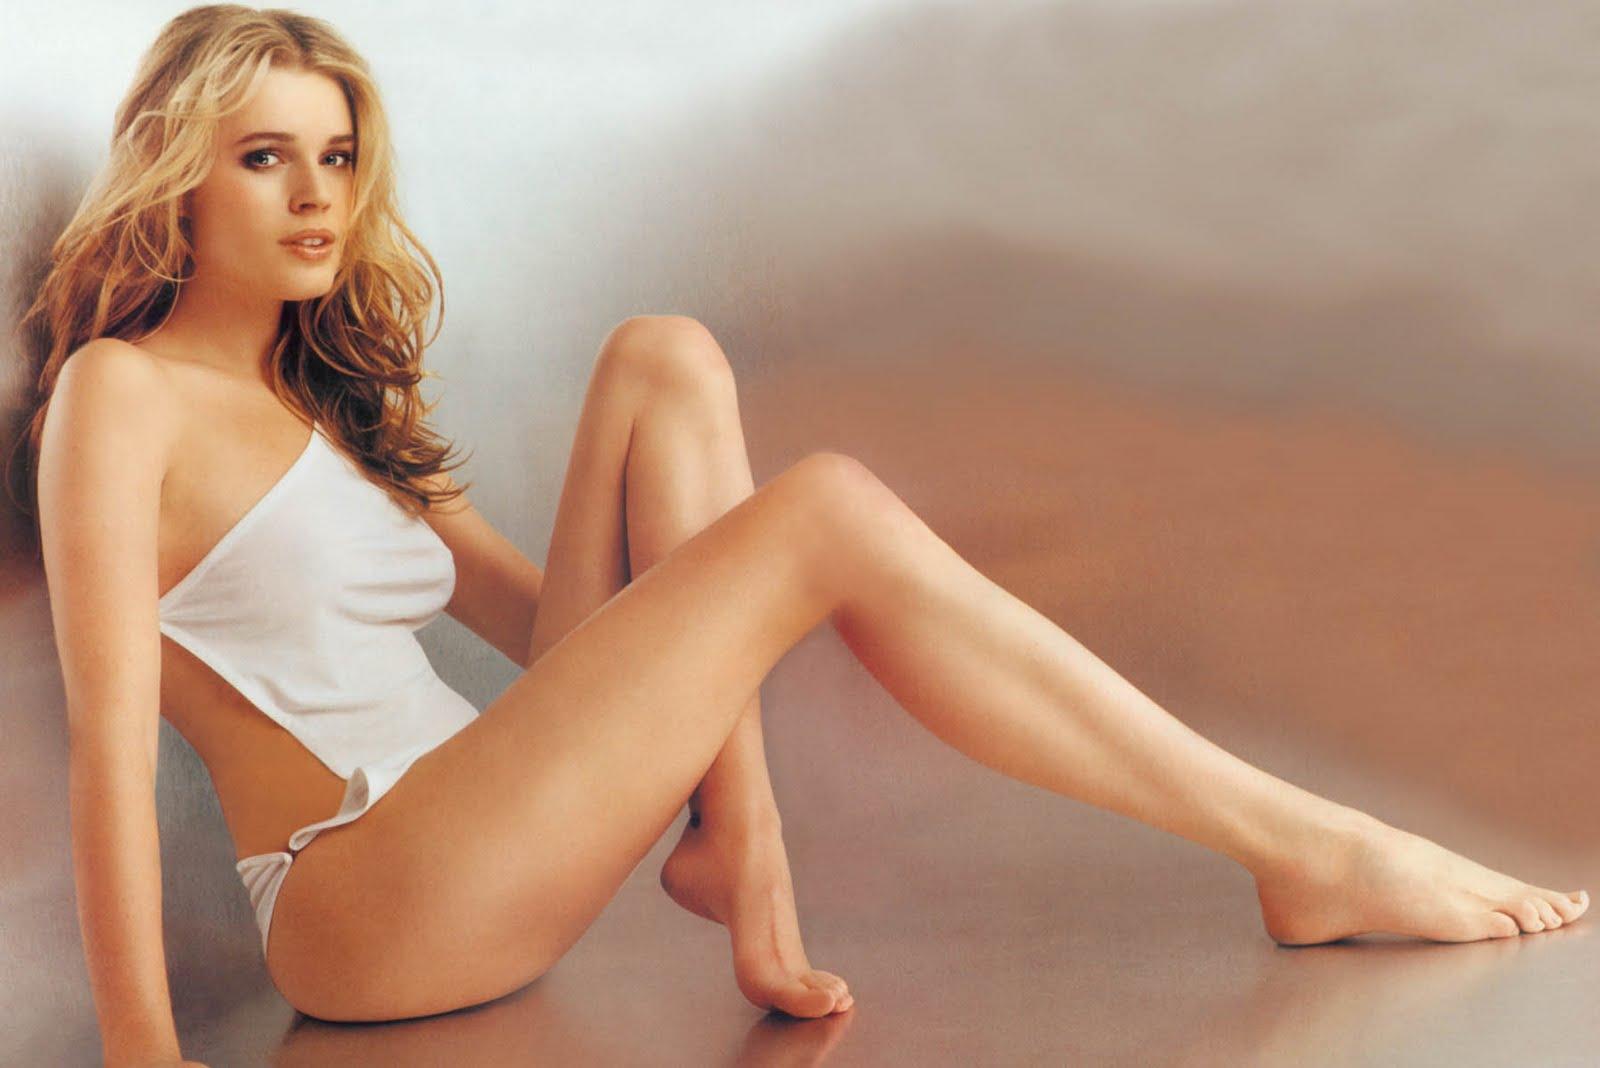 Rebecca ferguson actress feet myideasbedroom com